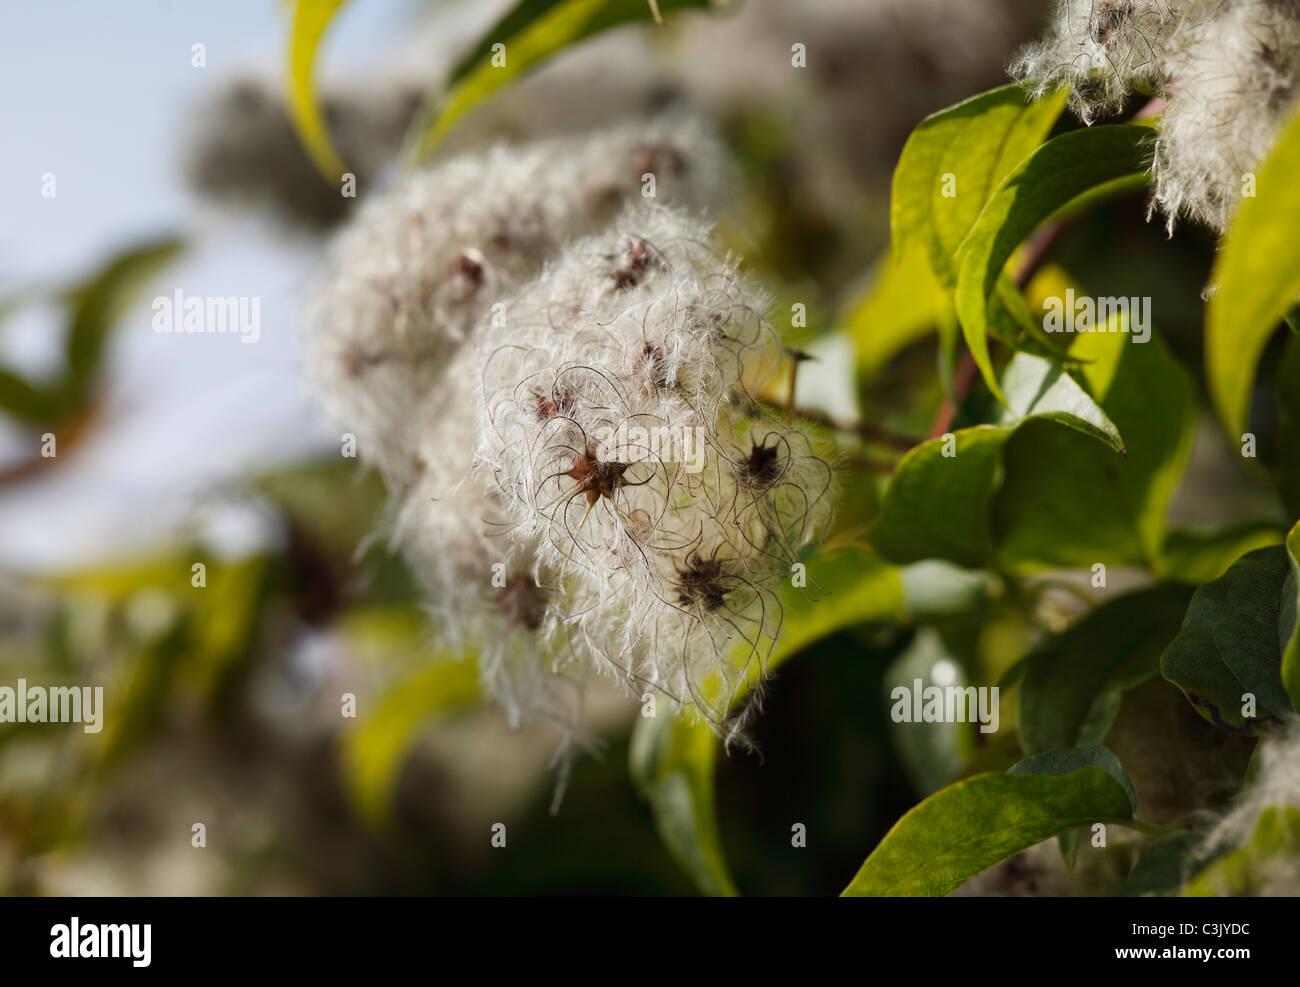 Austria, Traveller's joy fruit (Clematis vitalba), close-up - Stock Image